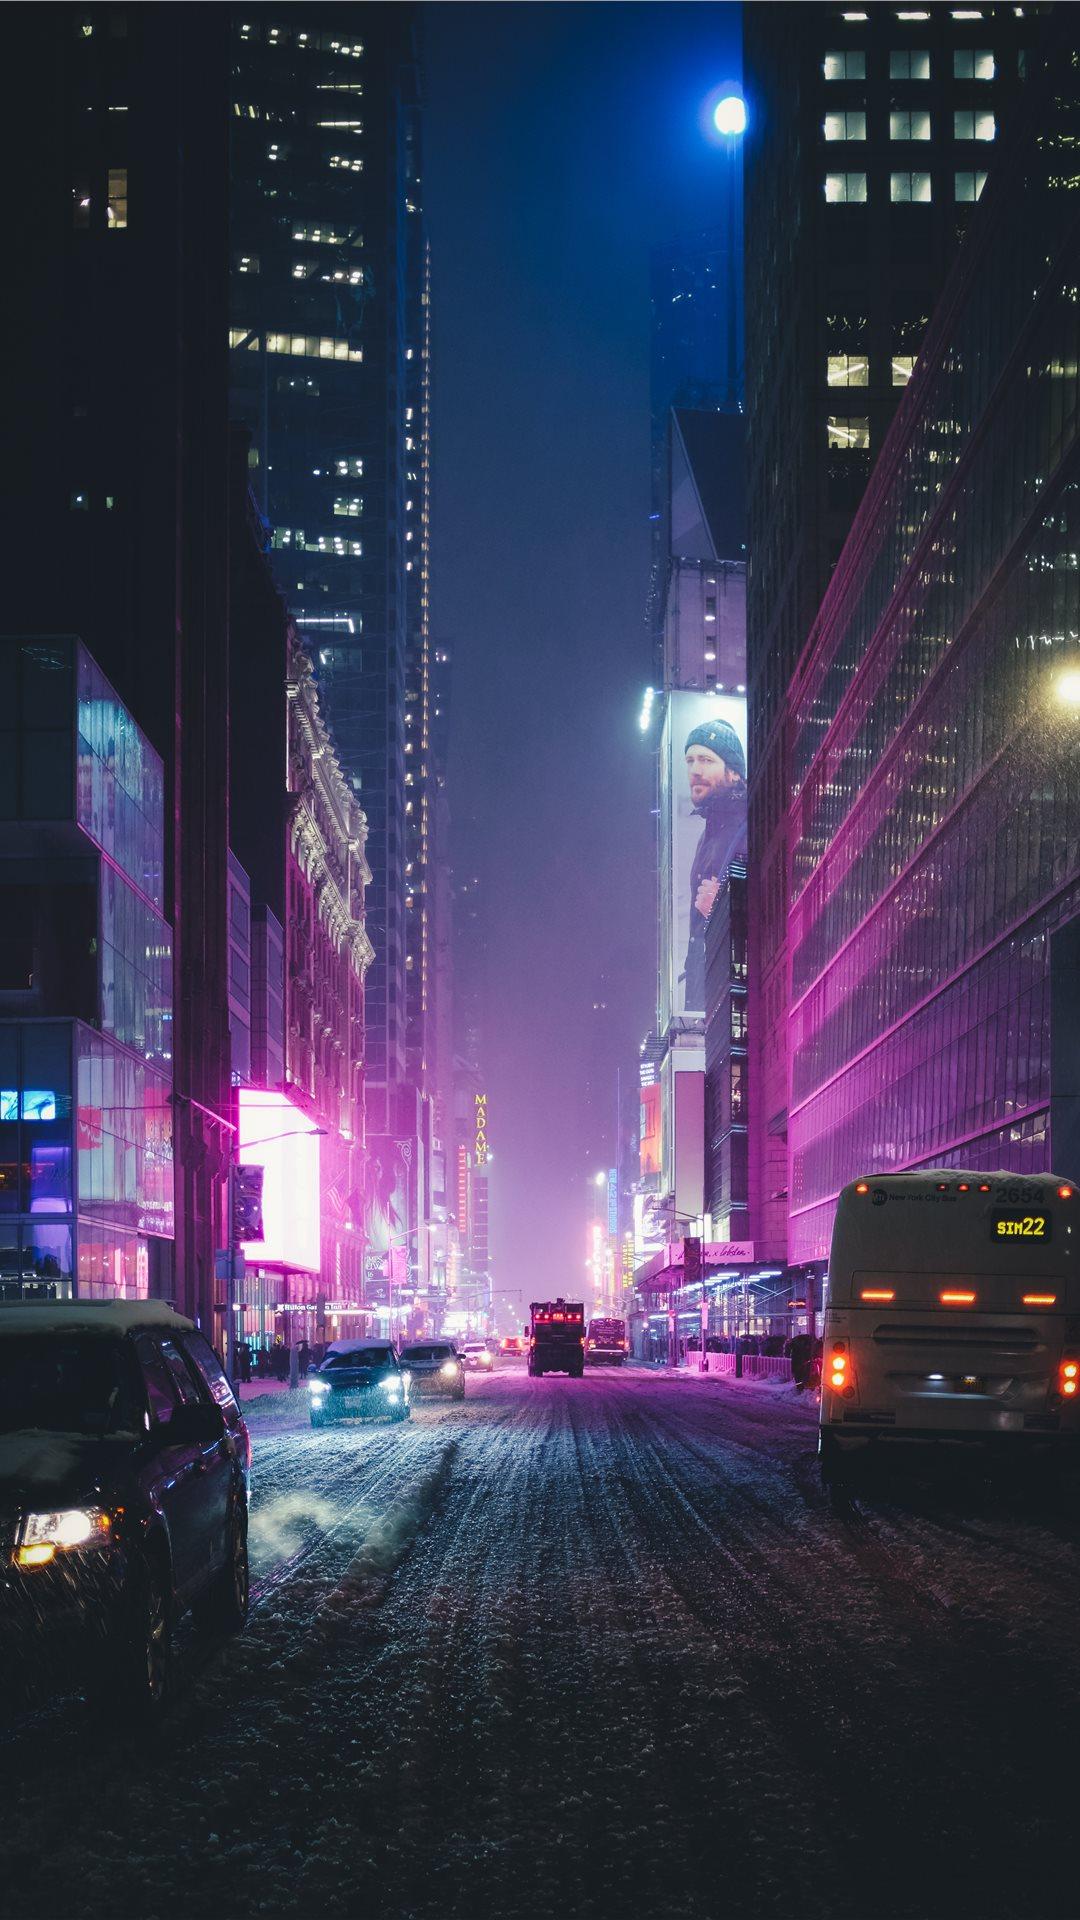 Neon New York Under The Snow Iphone X Wallpaper Download